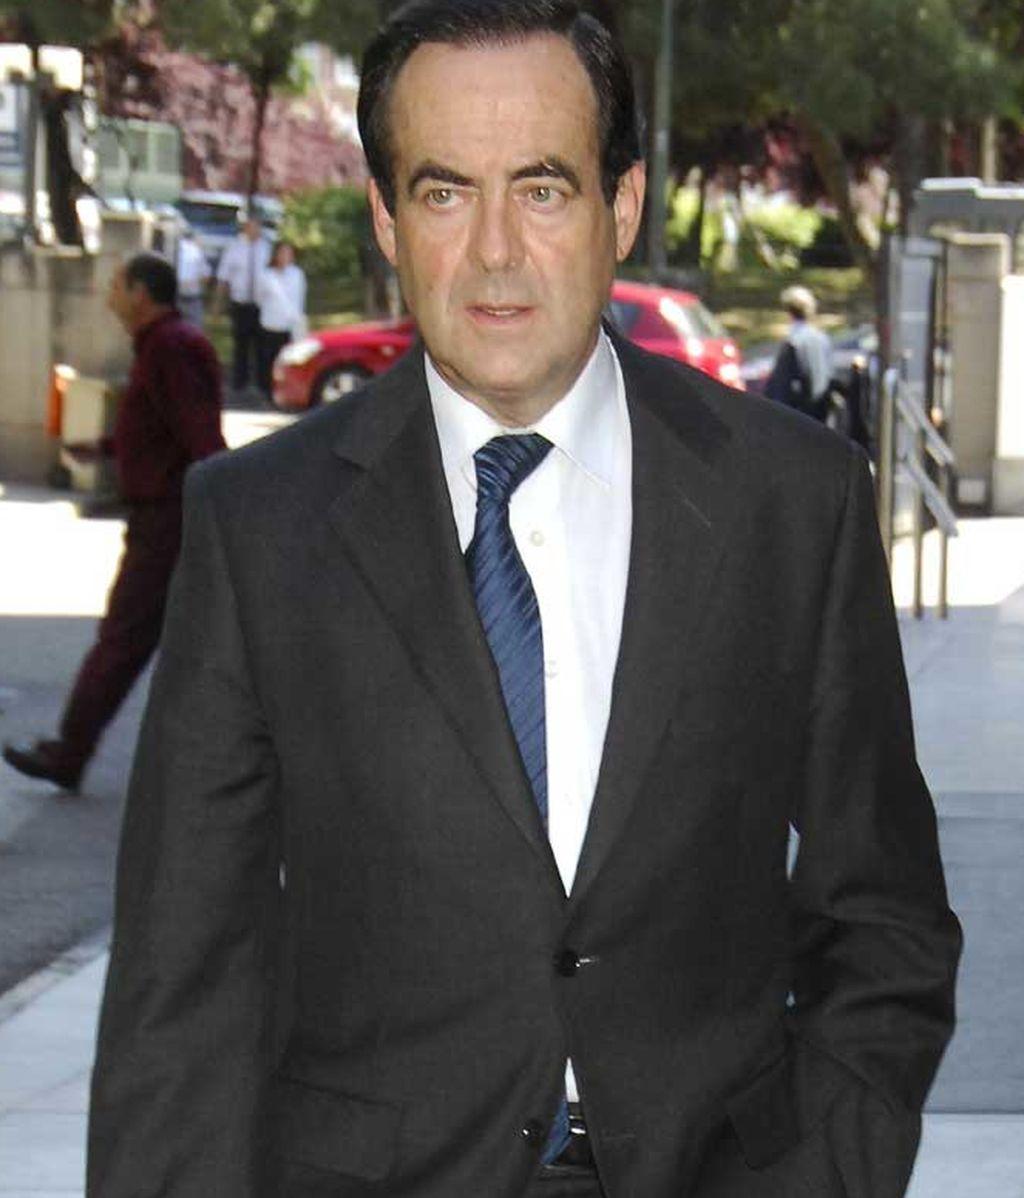 José Bono, en el tanatorio por la muerte de la mujer de Florentino Pérez (2012)